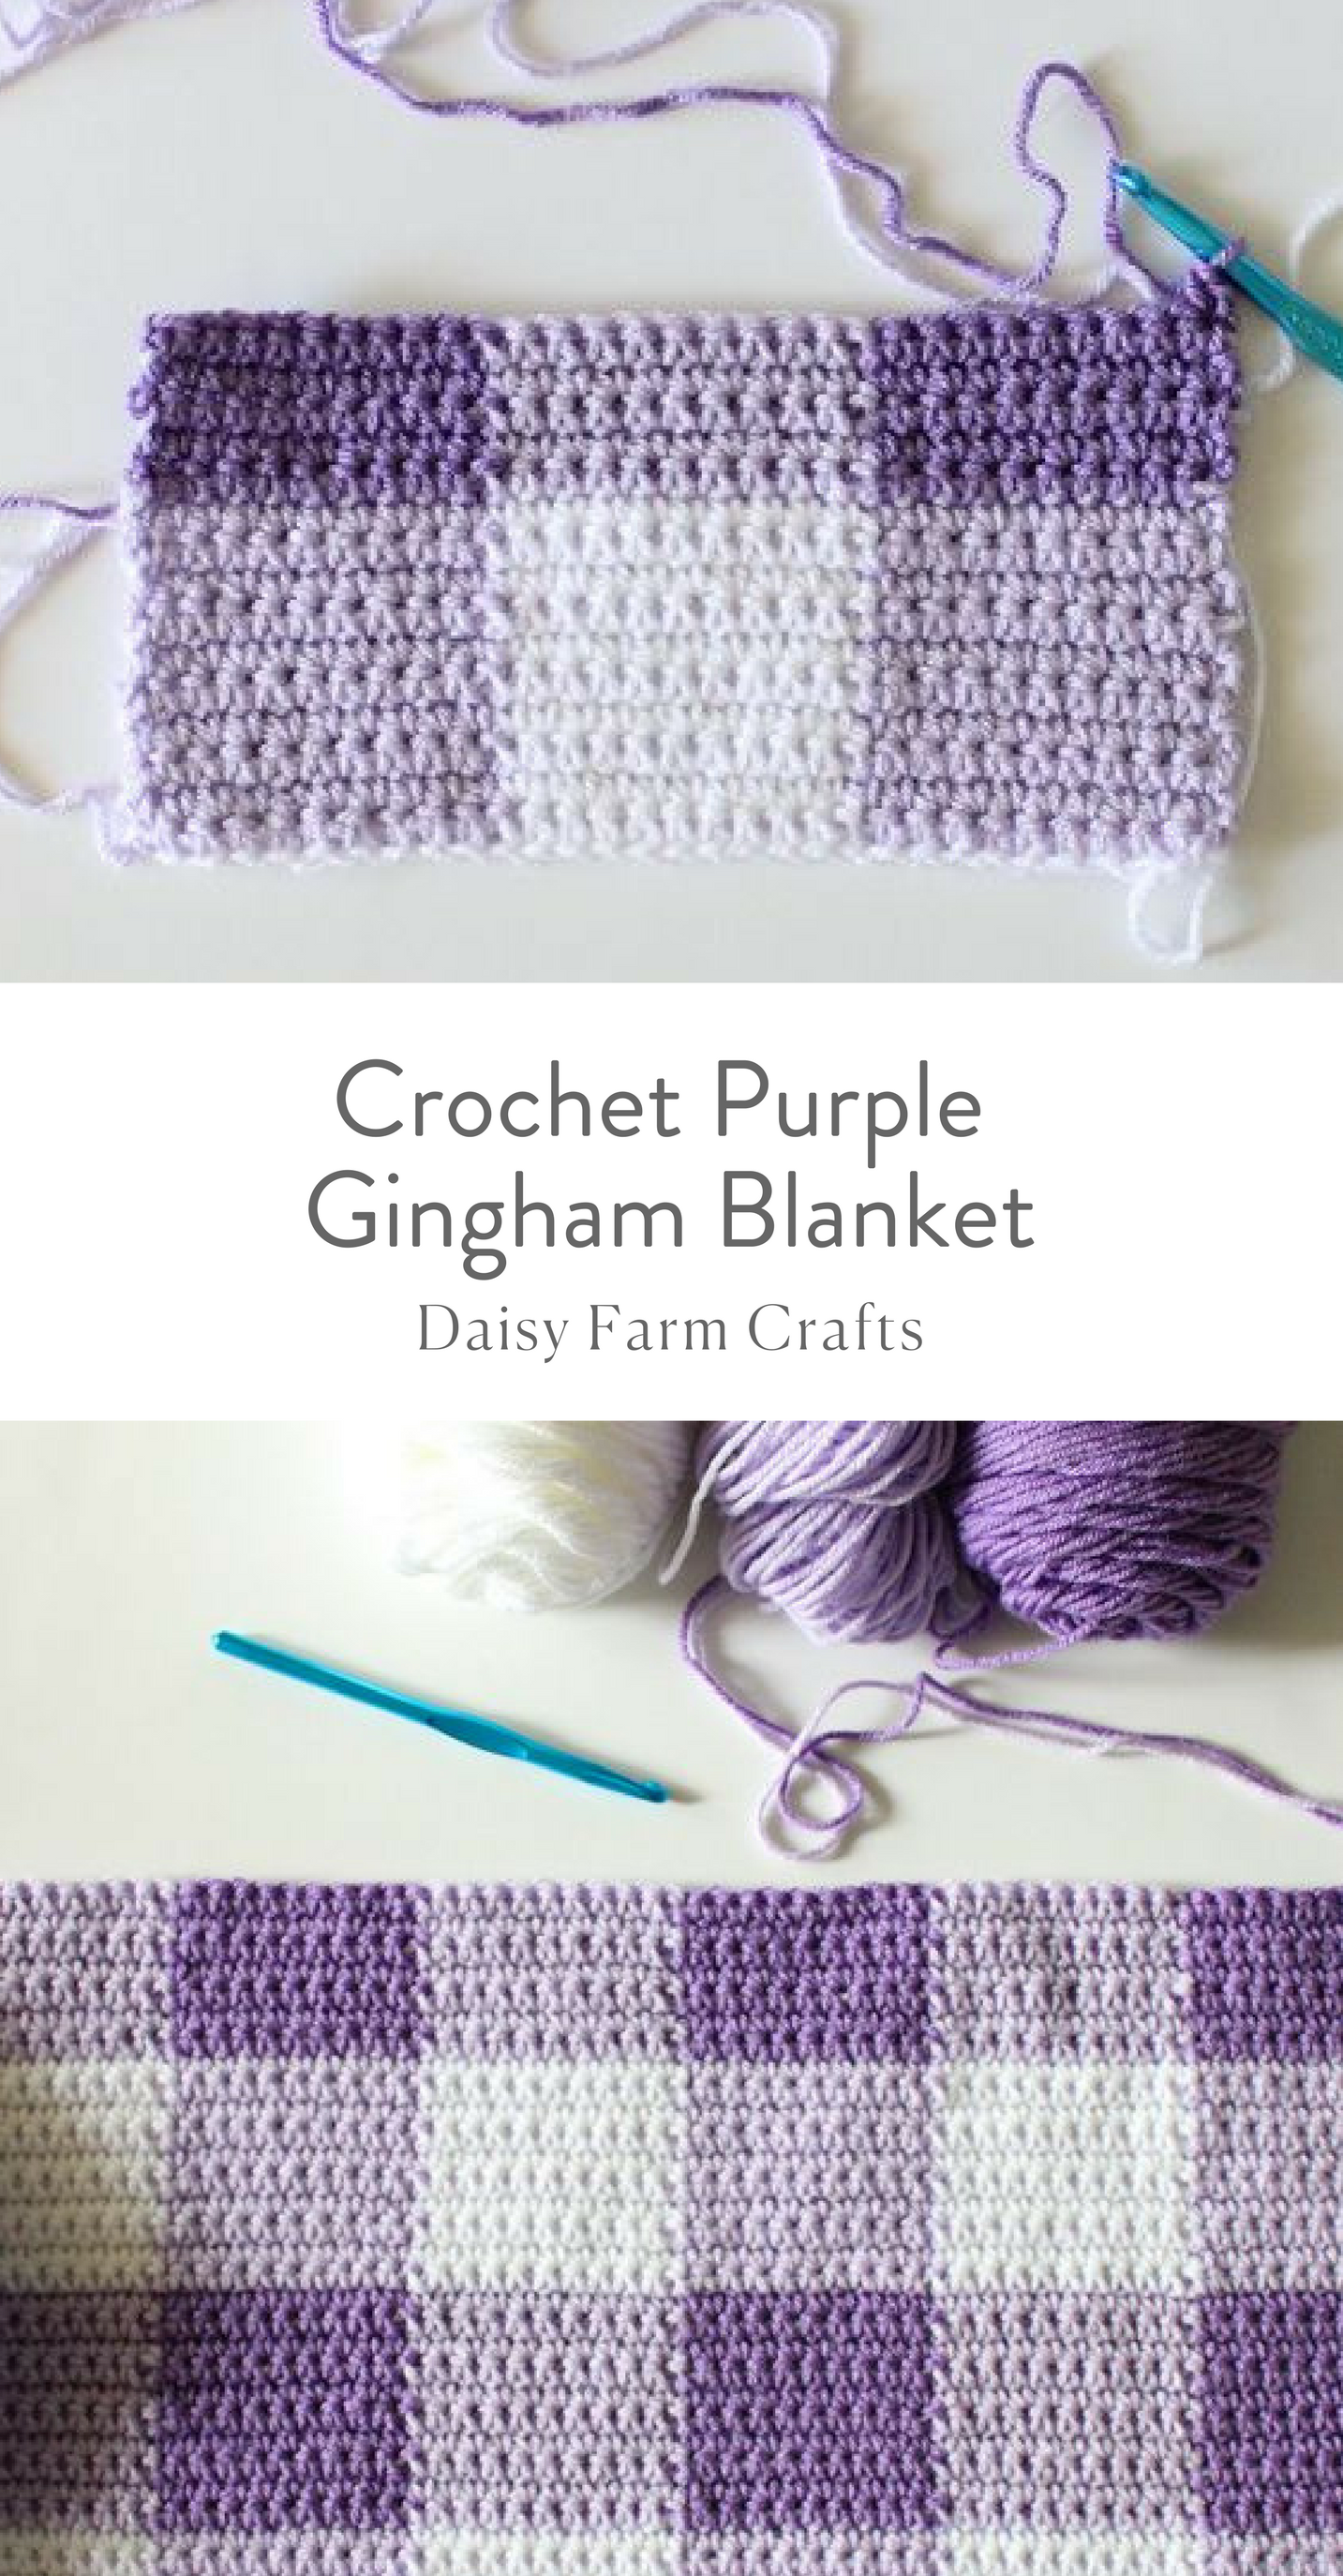 Free Pattern - Crochet Purple Gingham Blanket | Mantas crochet ...